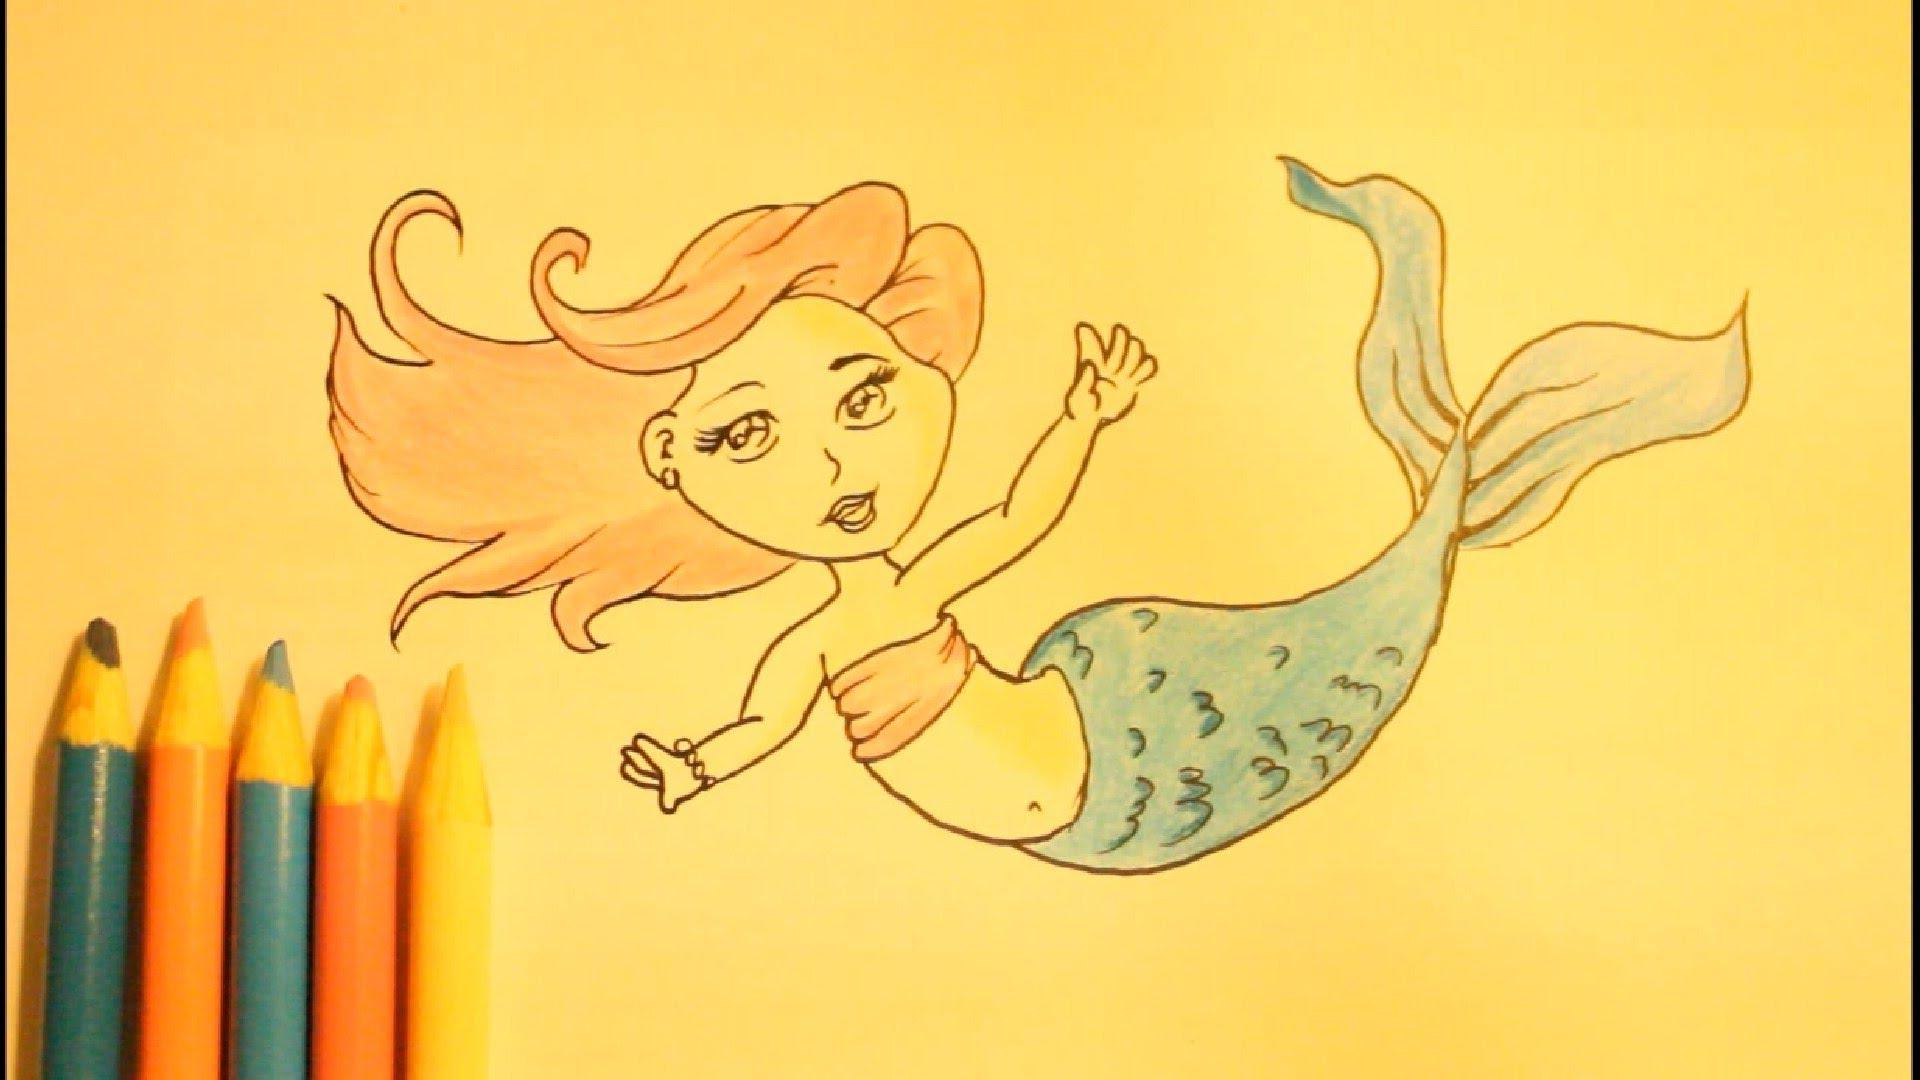 1920x1080 How To Draw A Mermaidstep By Step Slowlyfor Beginnerstaileasy